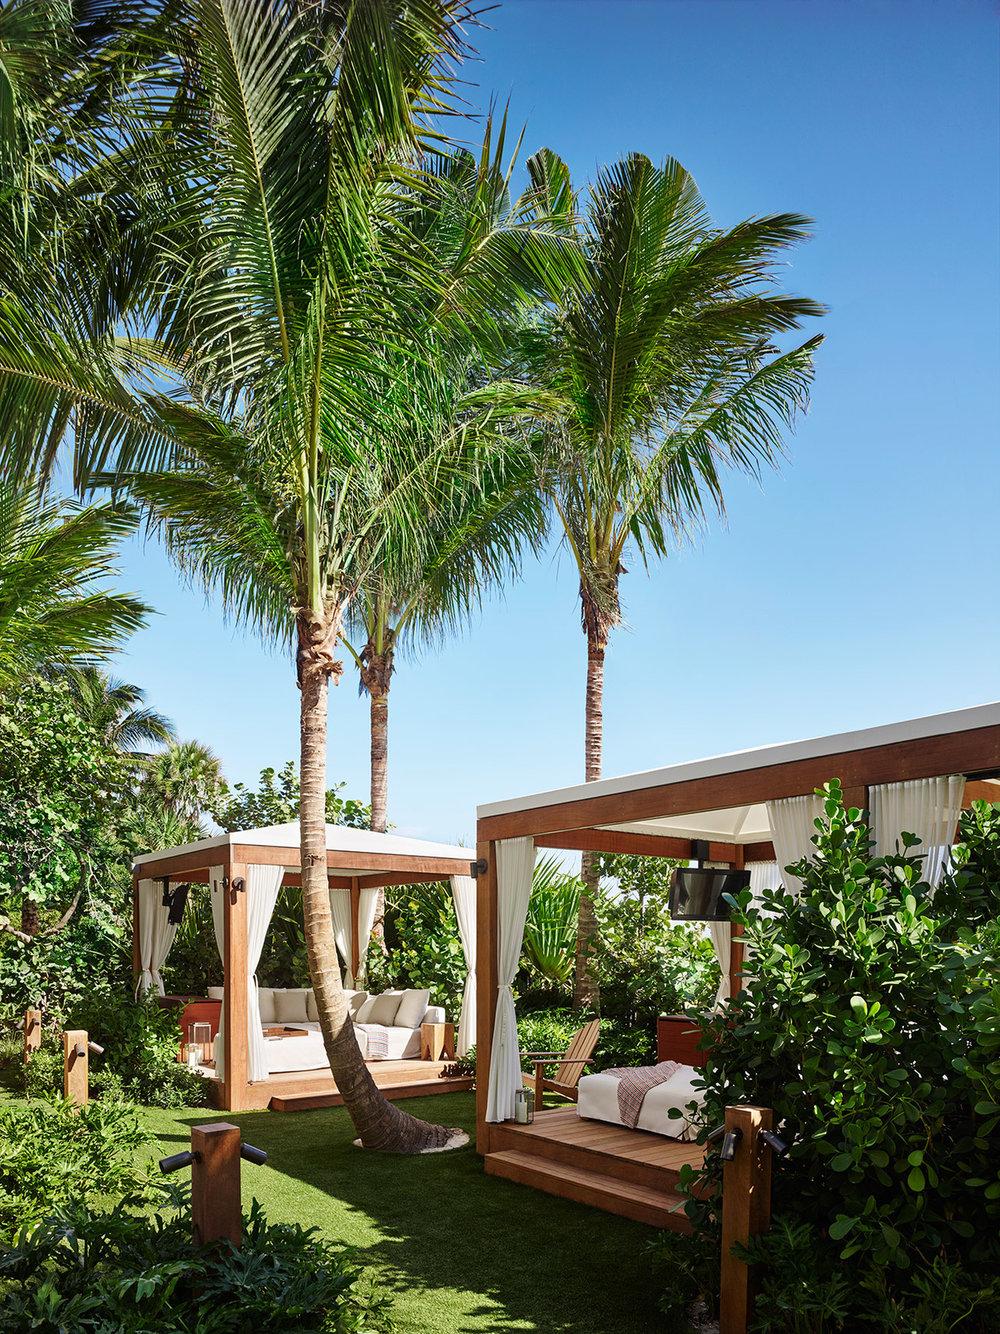 Cabanas. Courtesy of the Miami Beach EDITION.